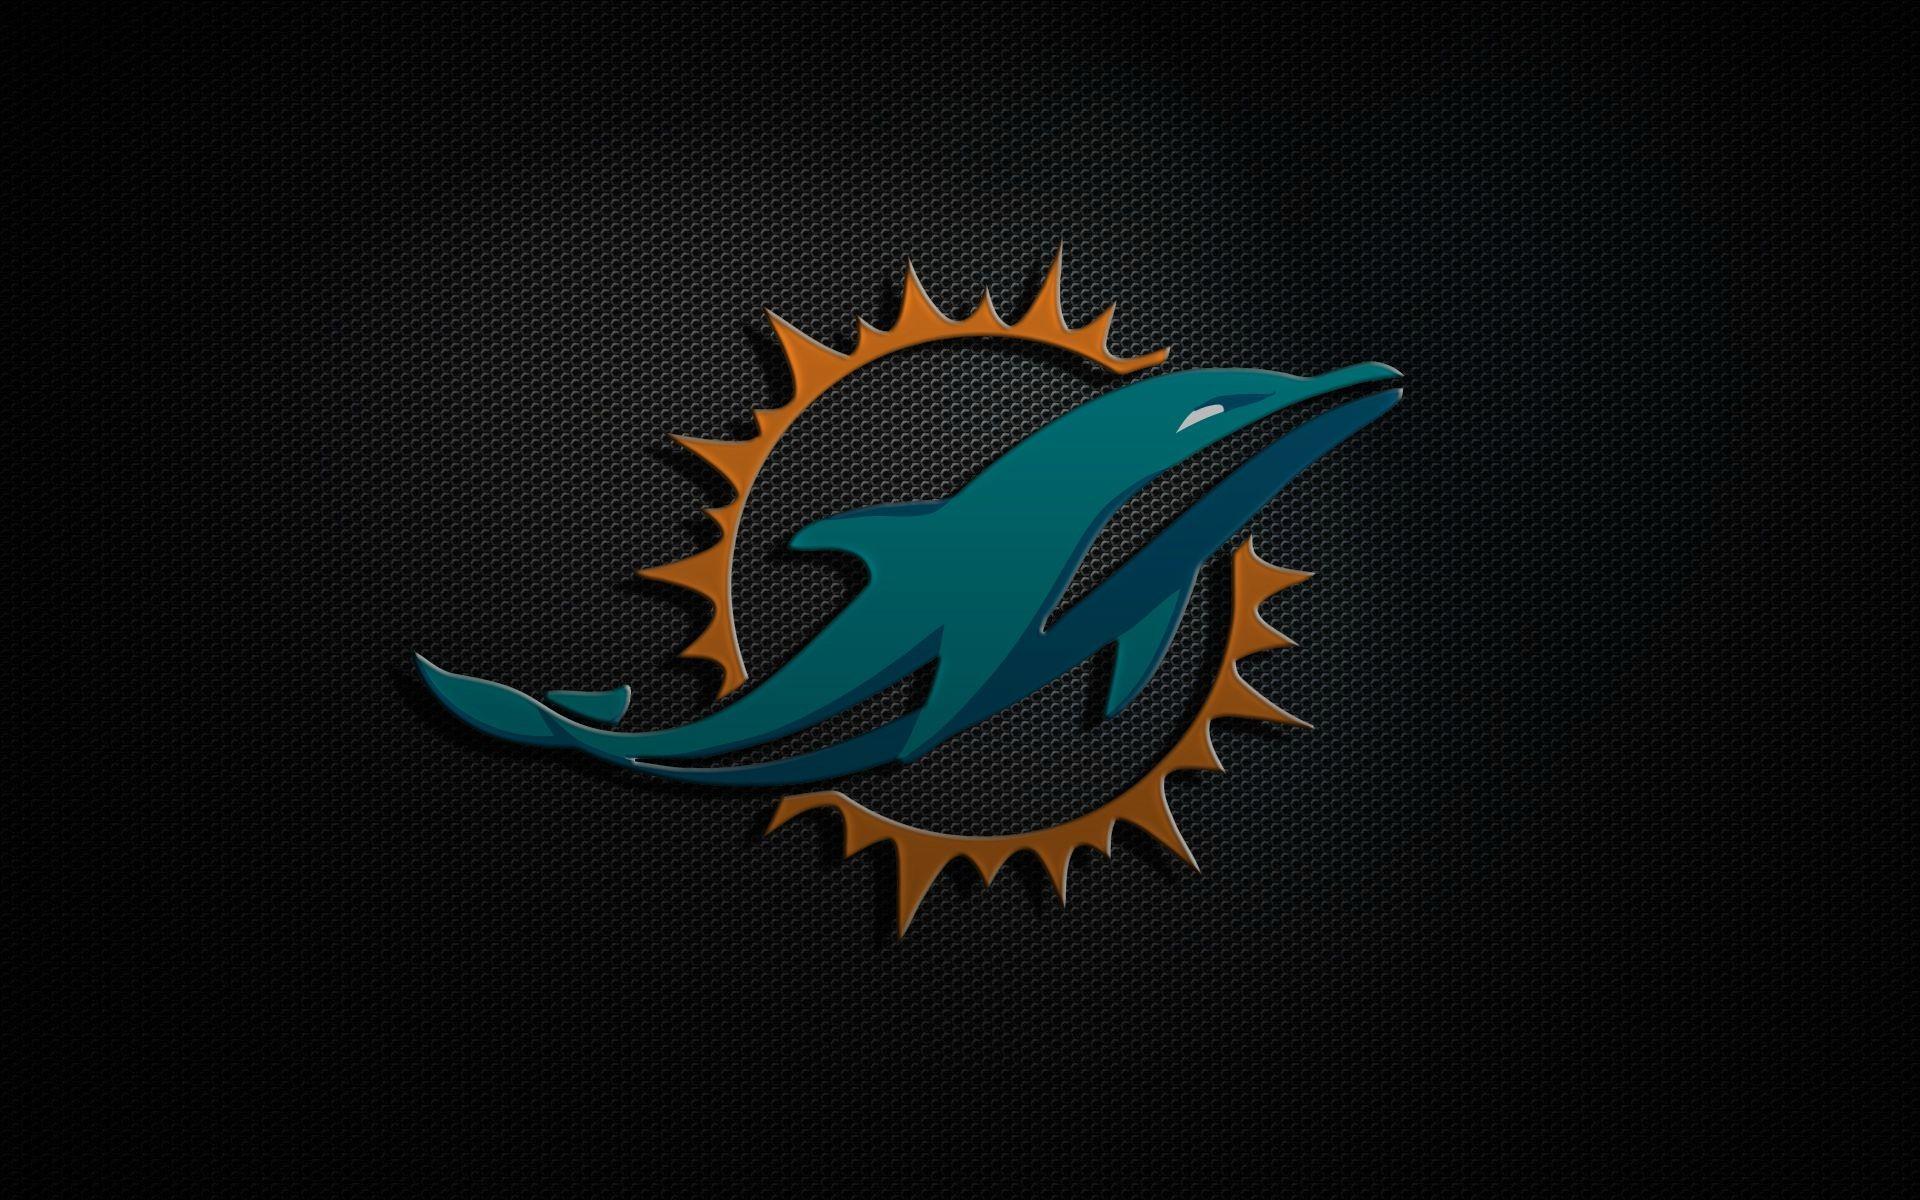 Dolphins Wallpaper HD Wallpaper 1080p   HD Desktop Wallpaper